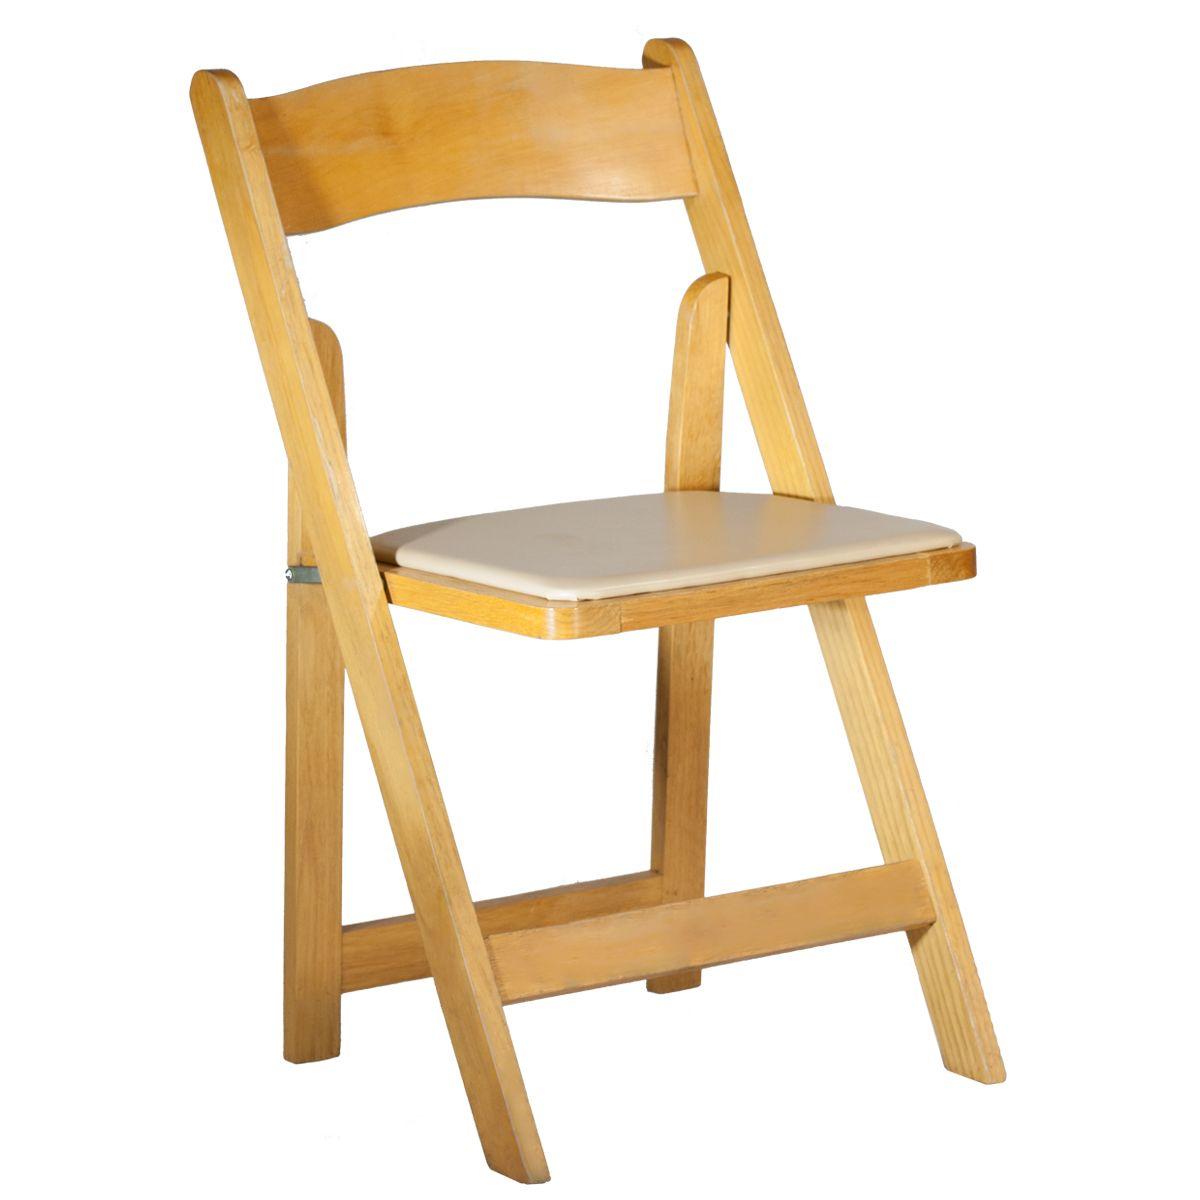 Hochzeit Klapp Stuhle 6 Klappstuhle Costco Gepolsterten Holz